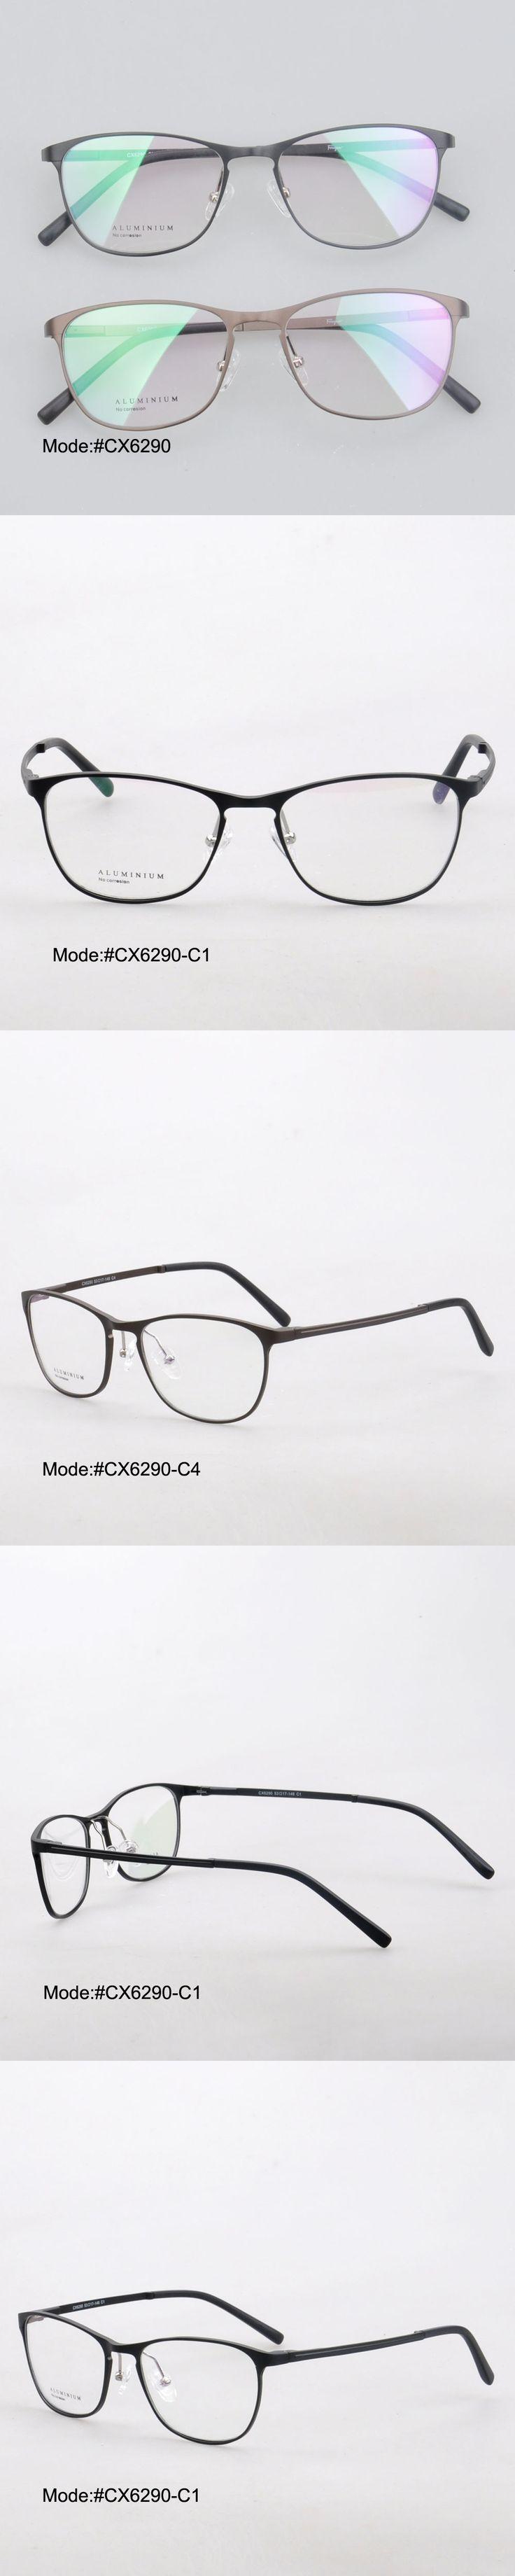 MY DOLI CX6290 men style full rim alloy aluminium RX optical frames myopia eyewear eyeglasses with spring hinge